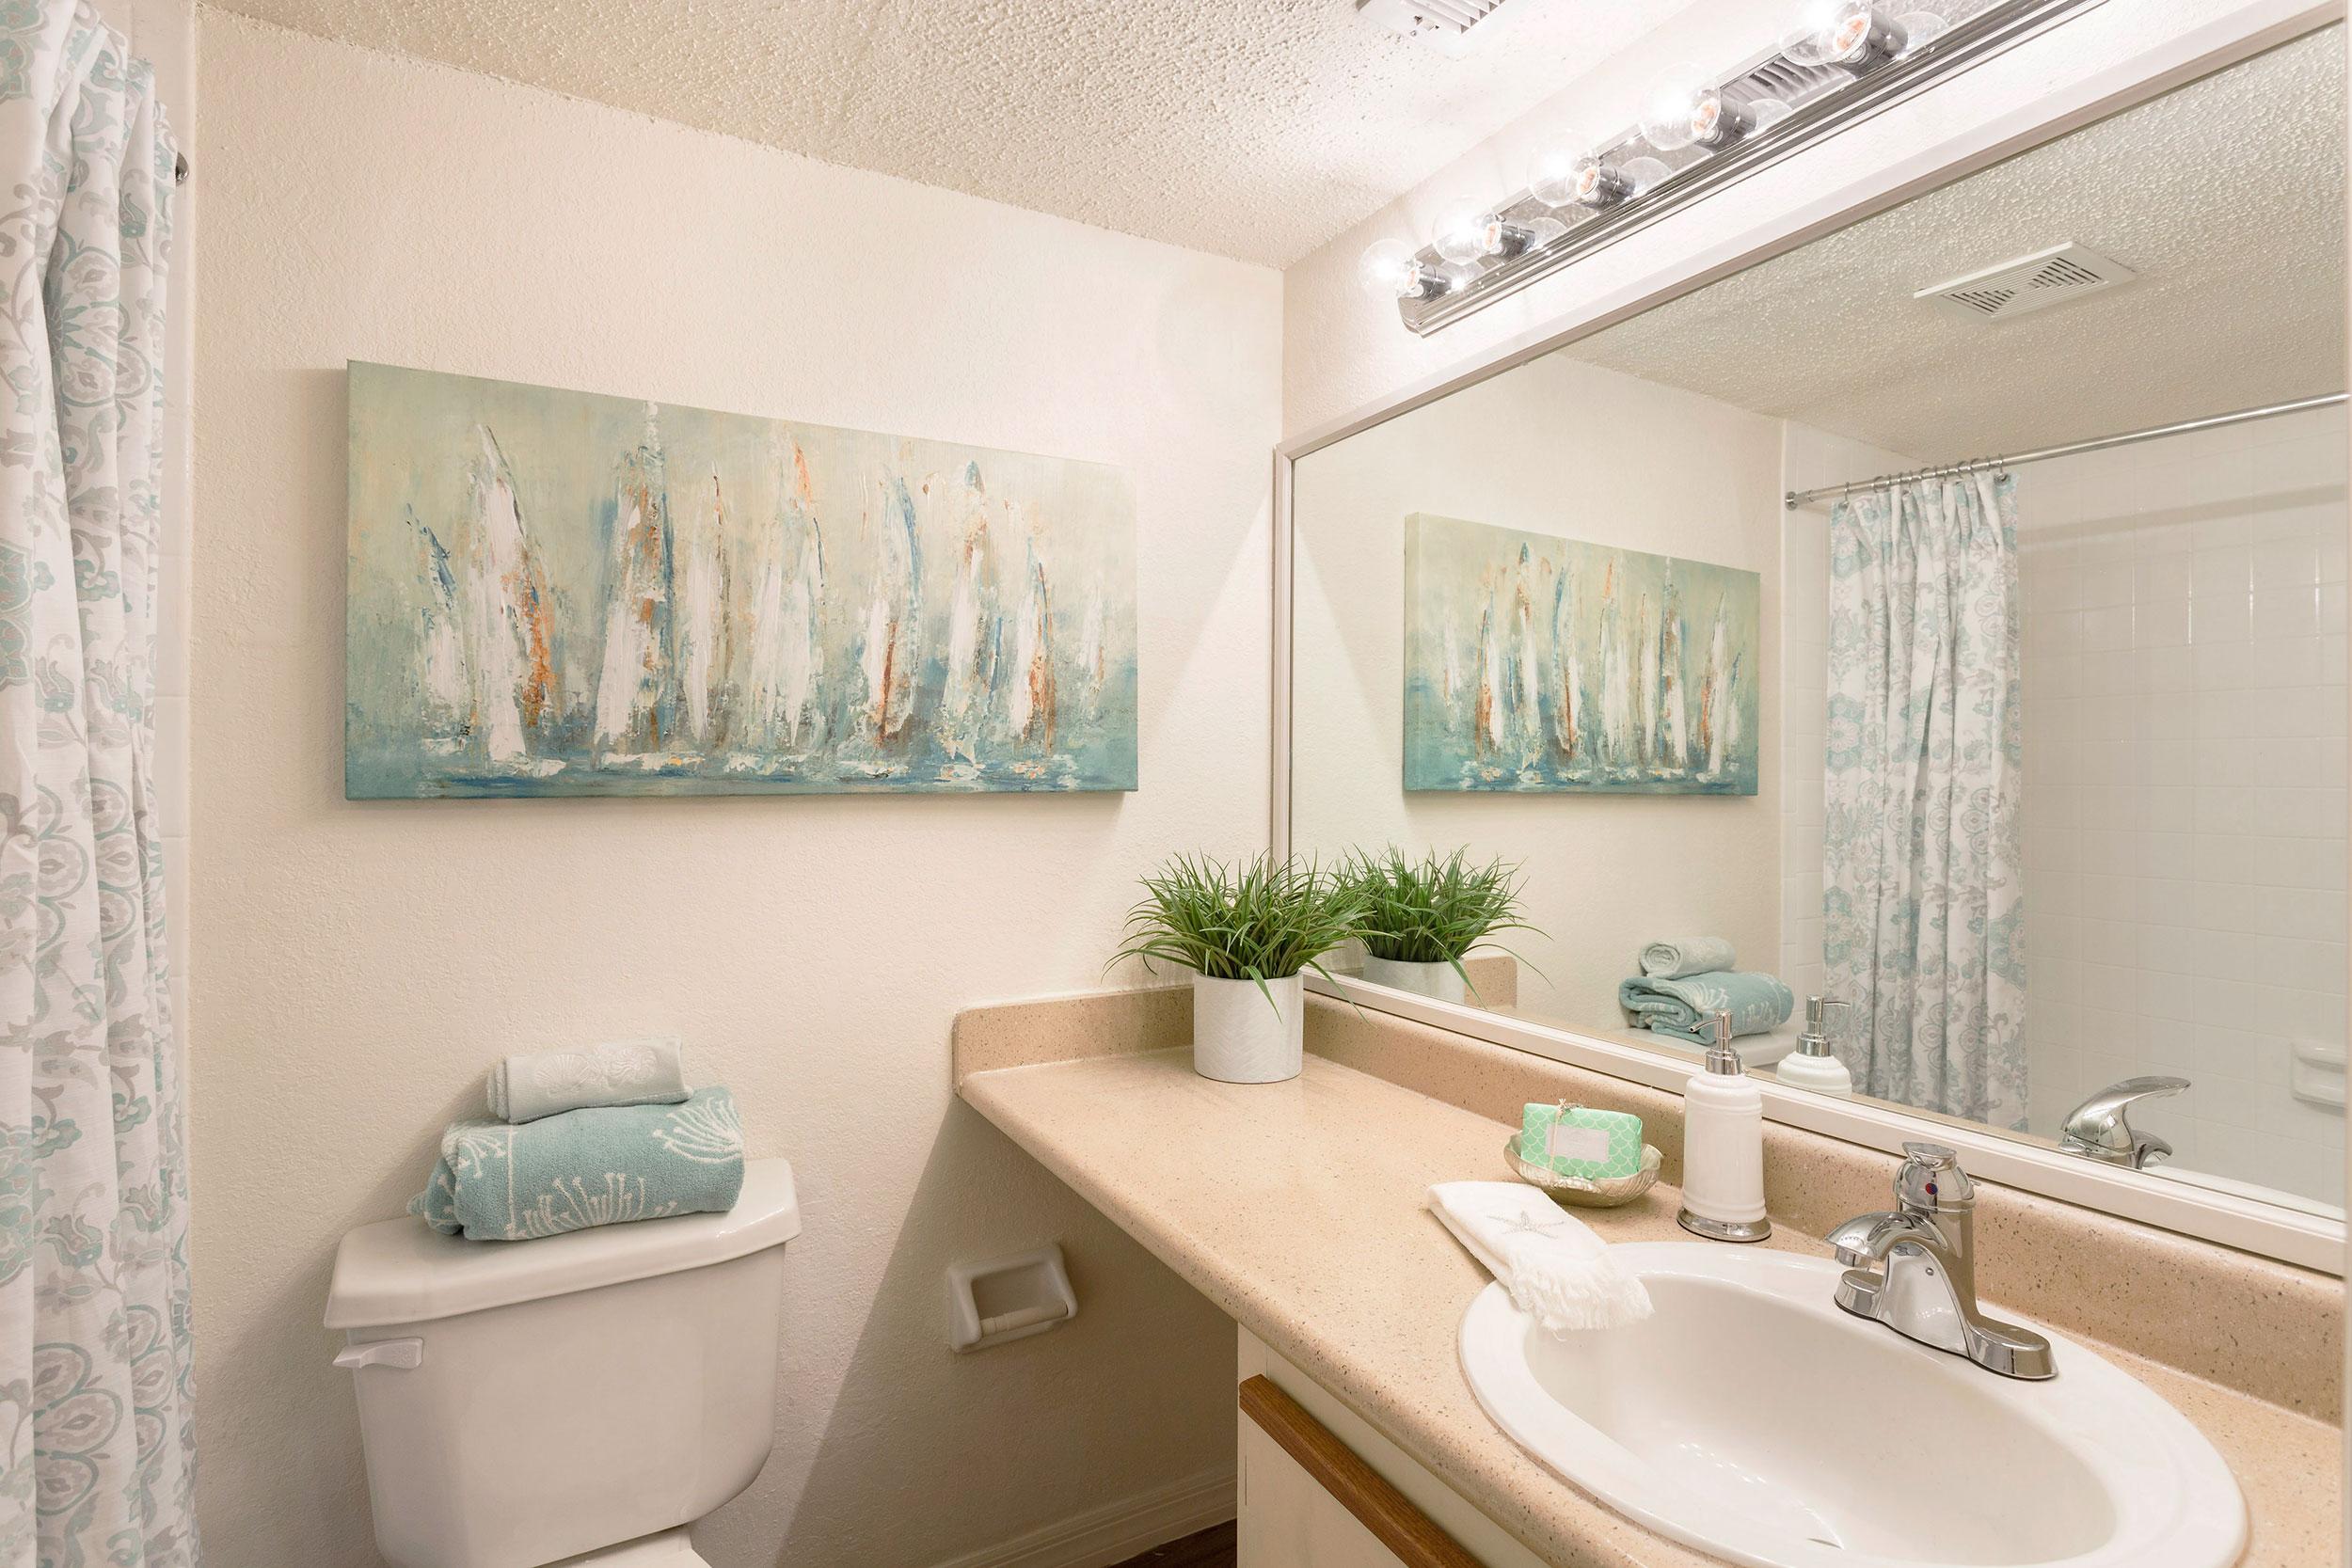 Hb-bathroom